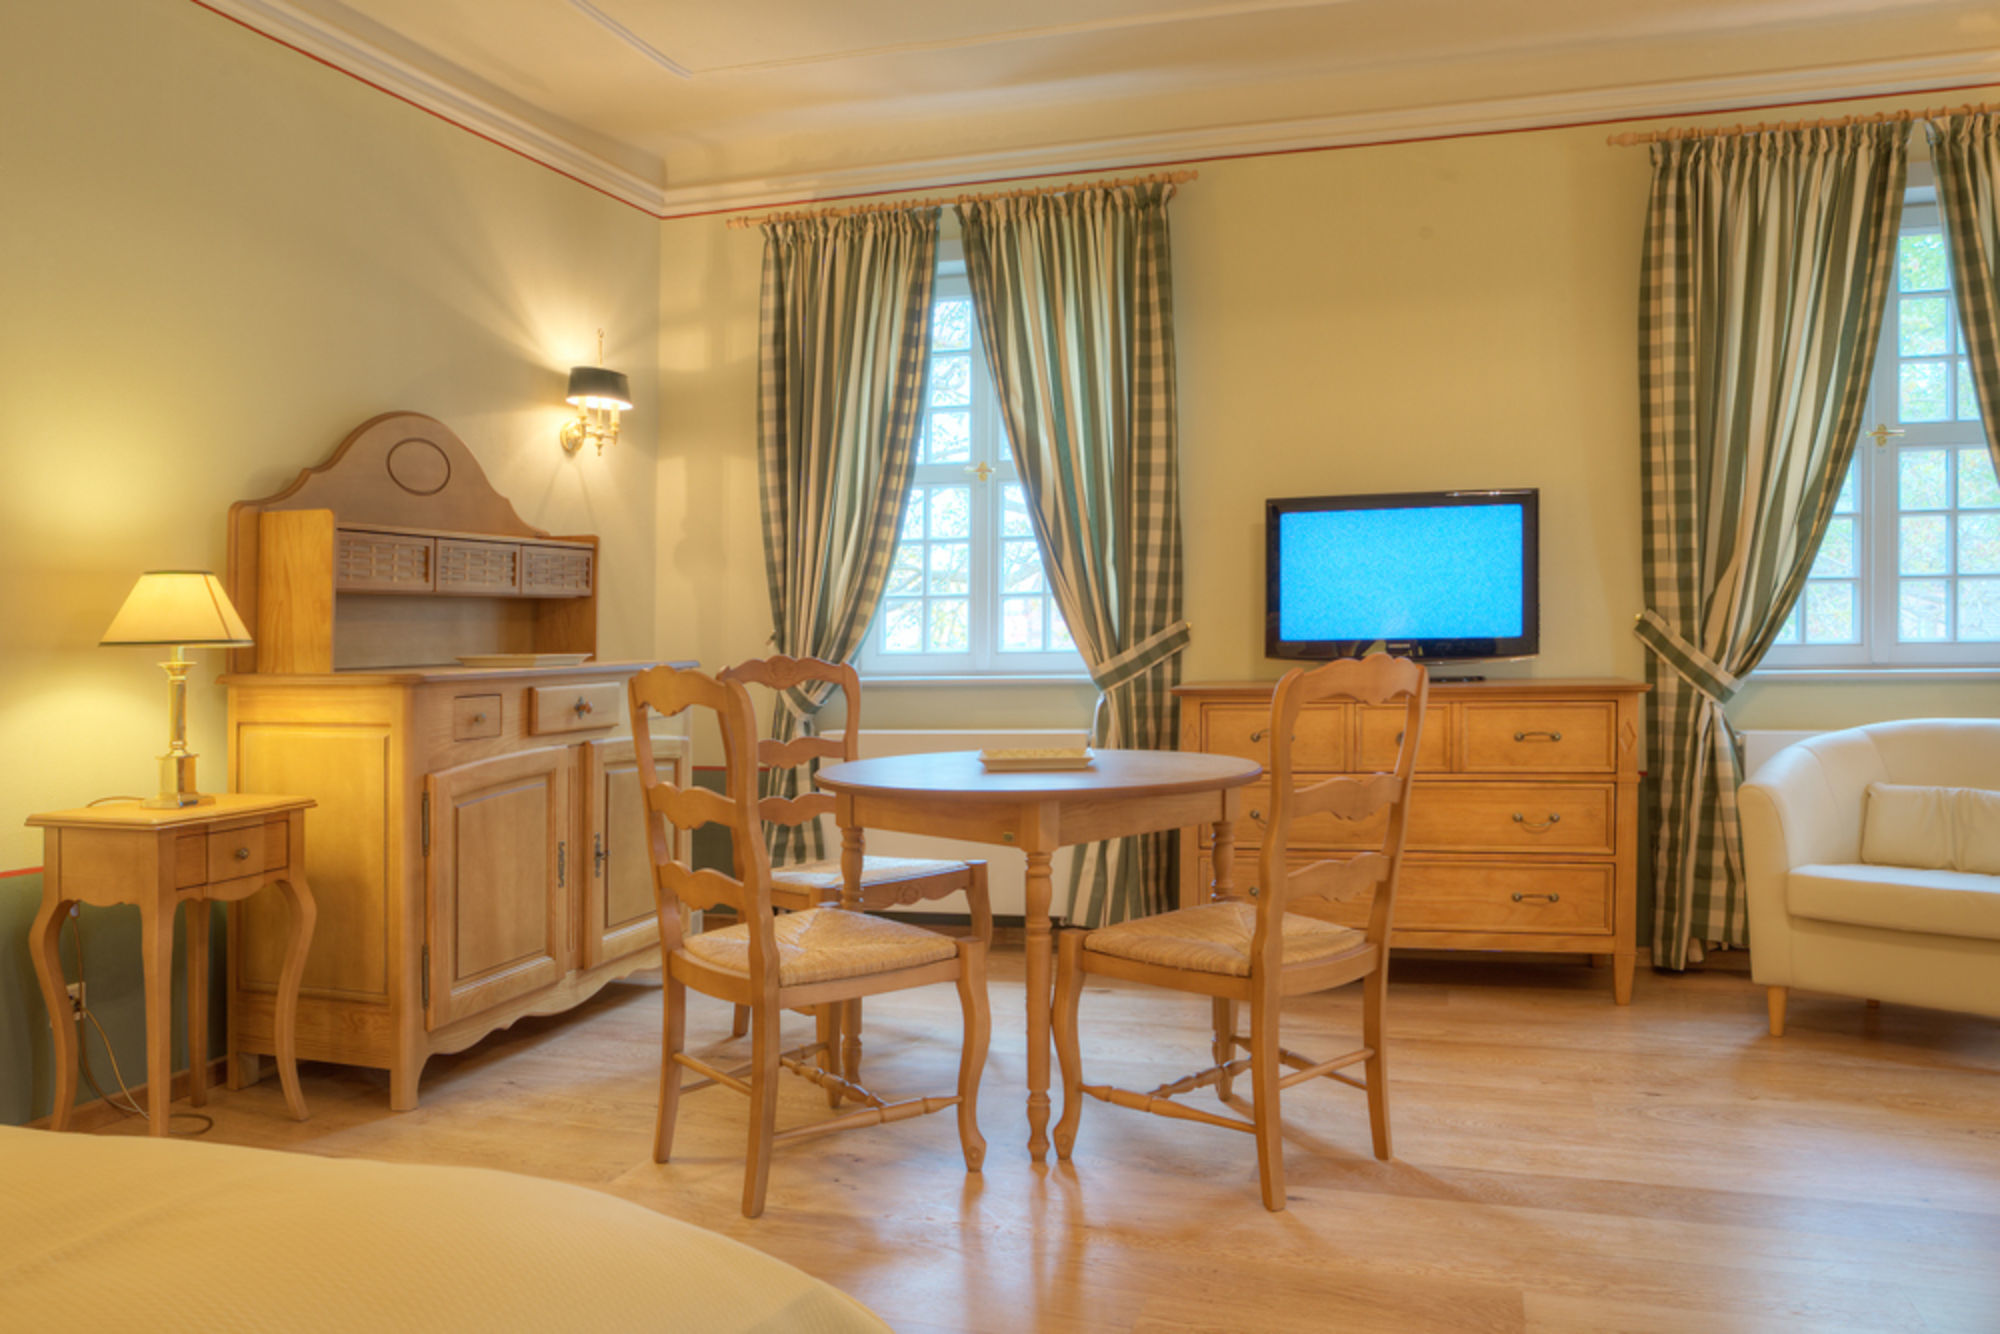 Urlaub Spreewald - Marstall - Die Urlaubsresidenz im Spreewald - Zimmer - Schloss Lübbenau im Spreewald